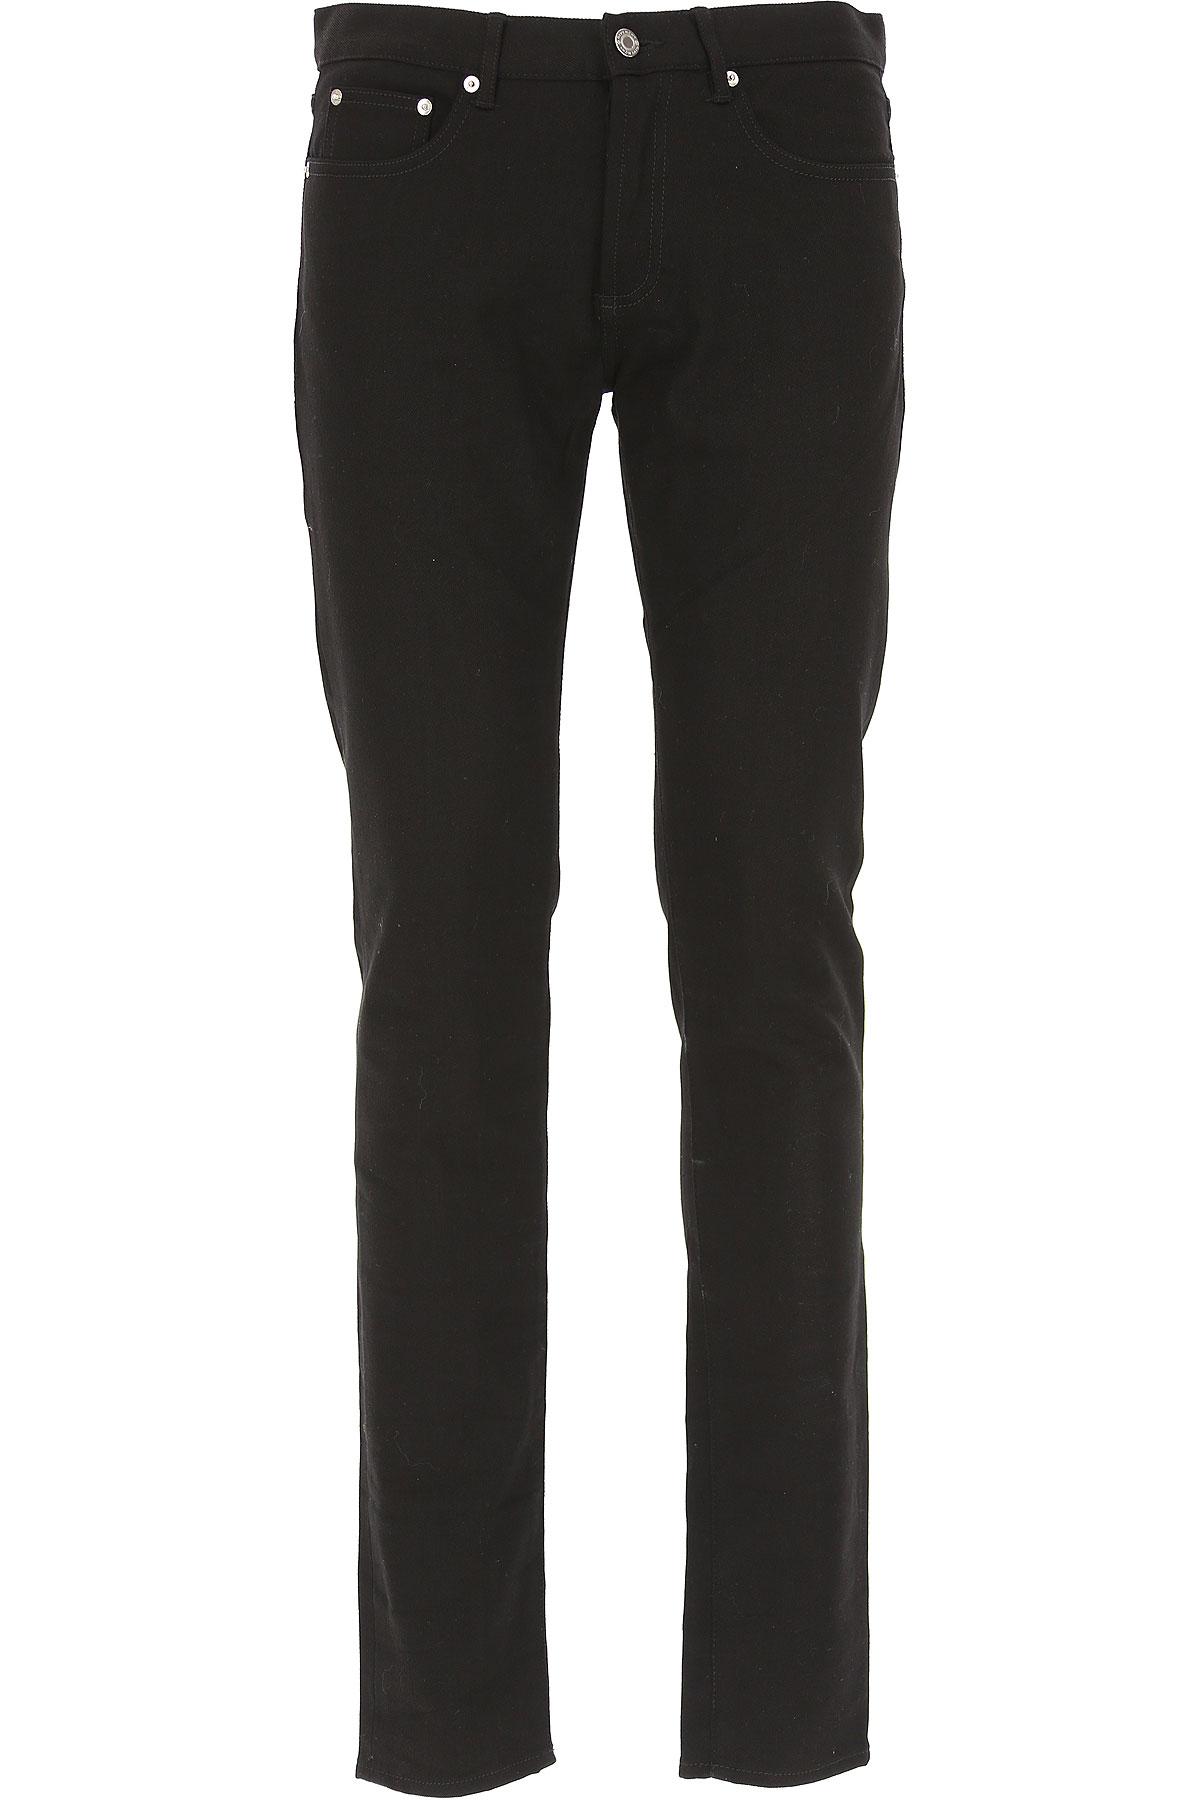 Givenchy Jeans On Sale, Black, Cotton, 2017, 30 31 USA-466682